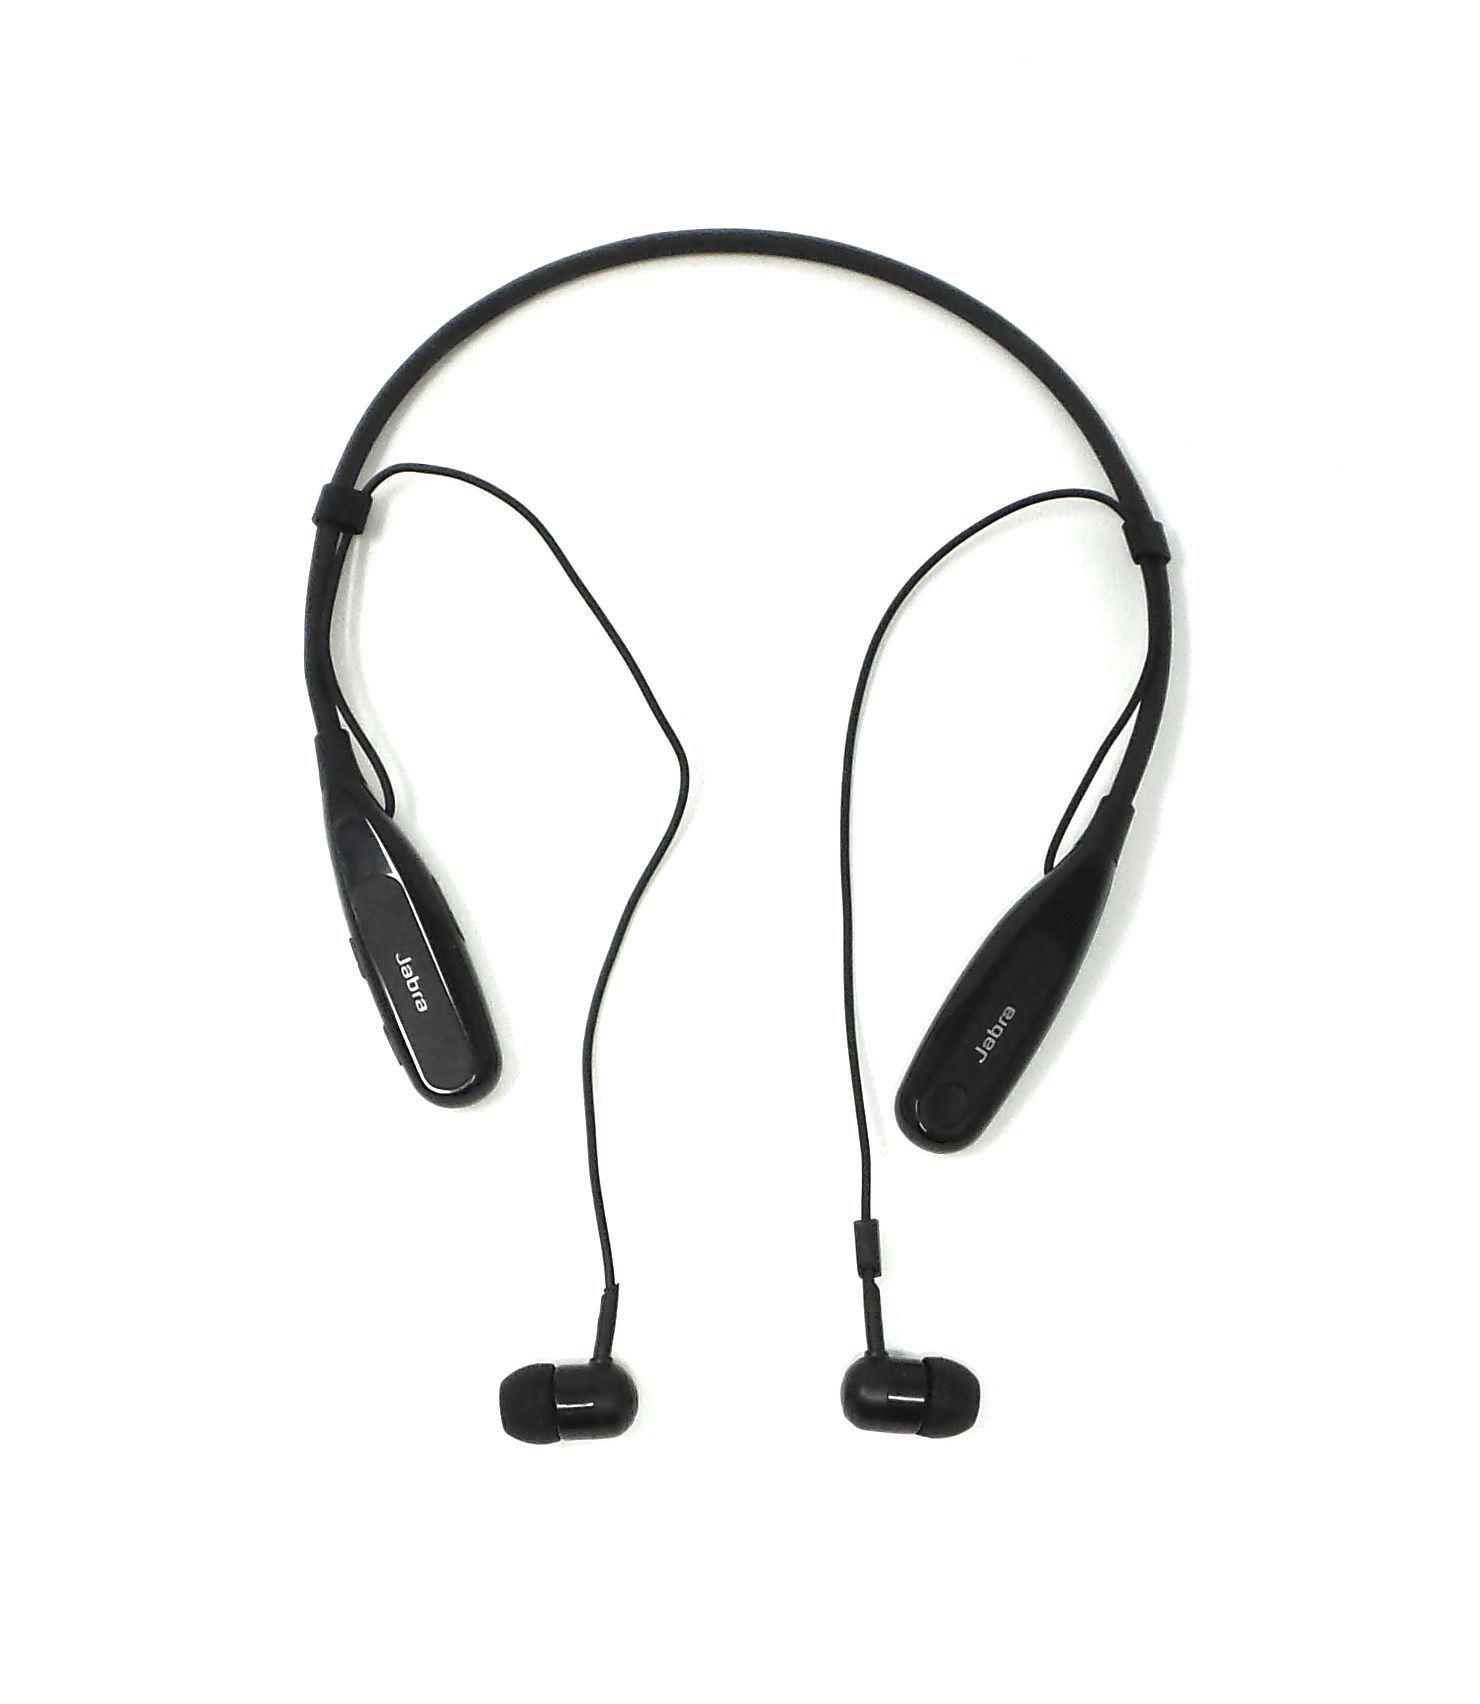 f0ec41cca3c Jabra Halo Fusion Bluetooth Wireless Stereo Headset w/ Mic Black Read Desc